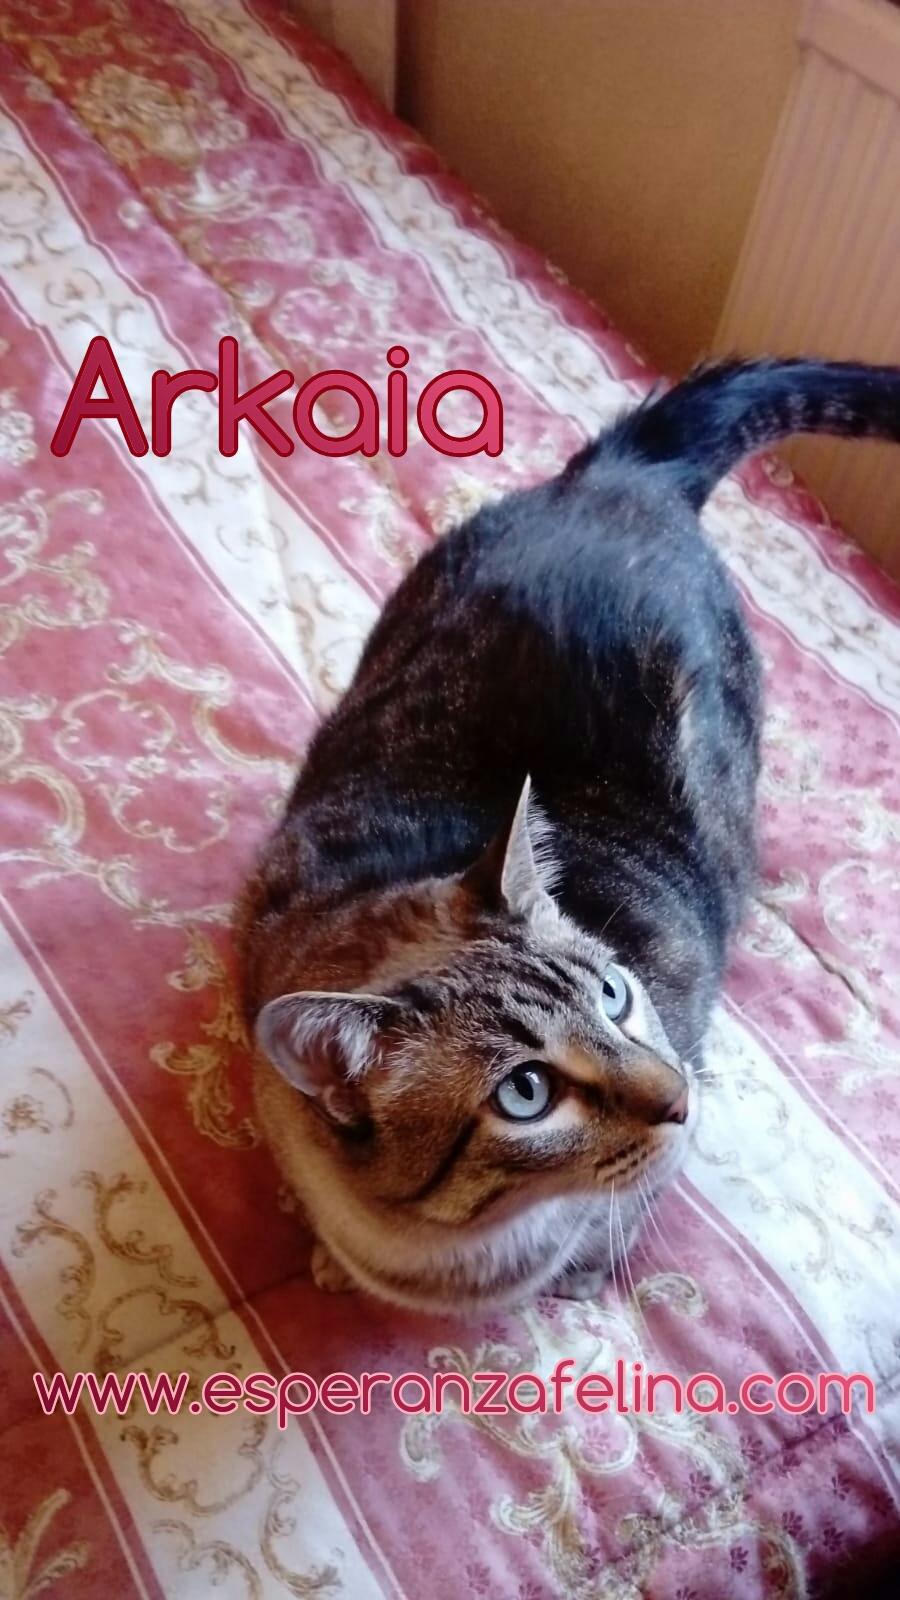 ARKAIA, gatita rescatada en la zona de Arkaiate (F.N. aprox: 1/01/2016) Álava Photos26